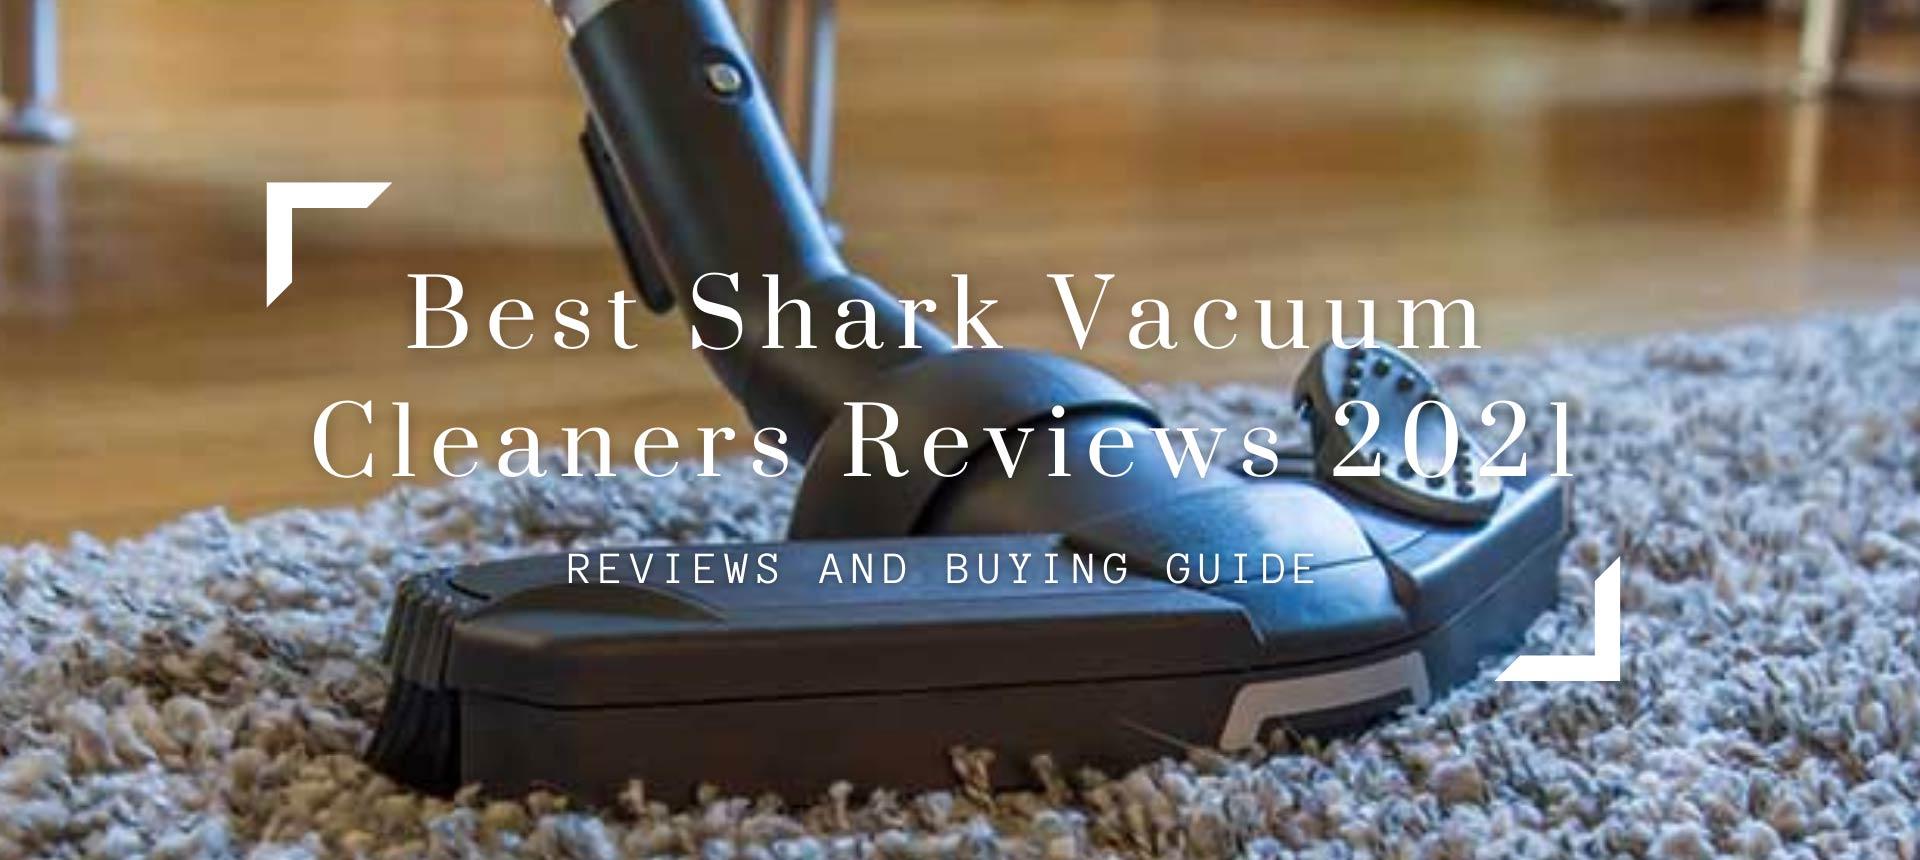 Best Shark Vacuum Cleaners Reviews 2021